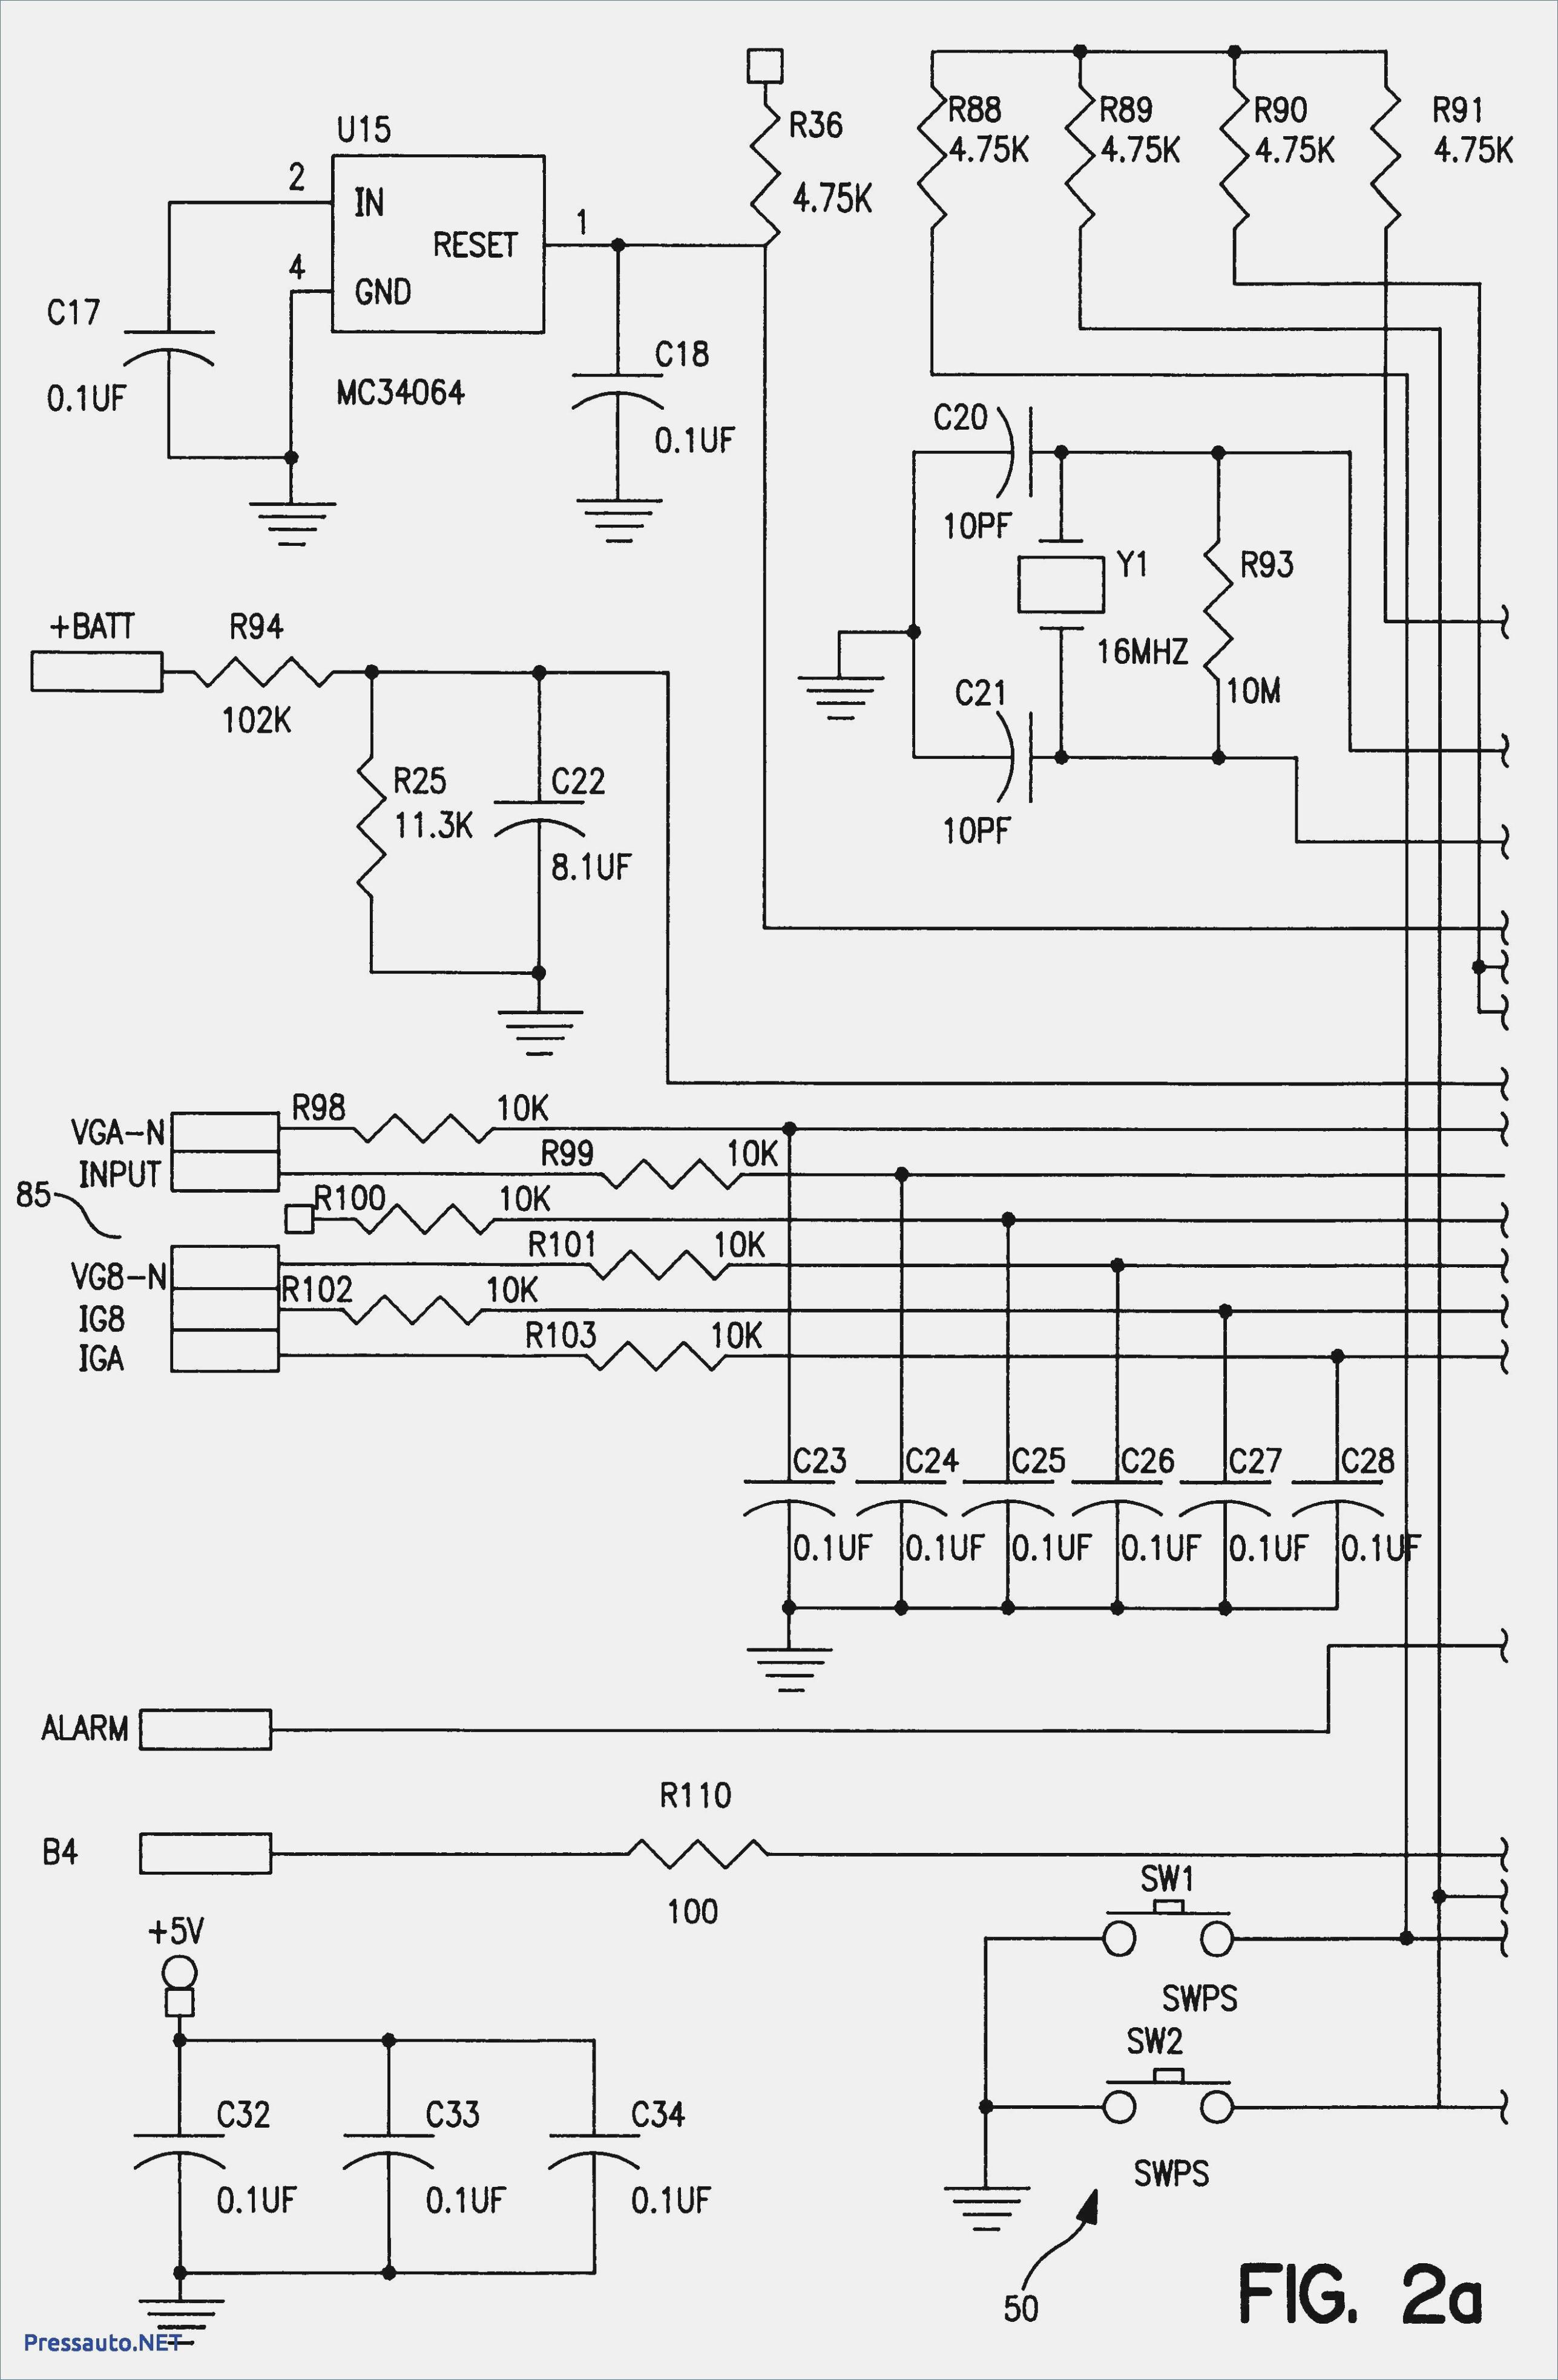 Generac Battery Charger Wiring Diagram | Manual E-Books - Generac Battery Charger Wiring Diagram